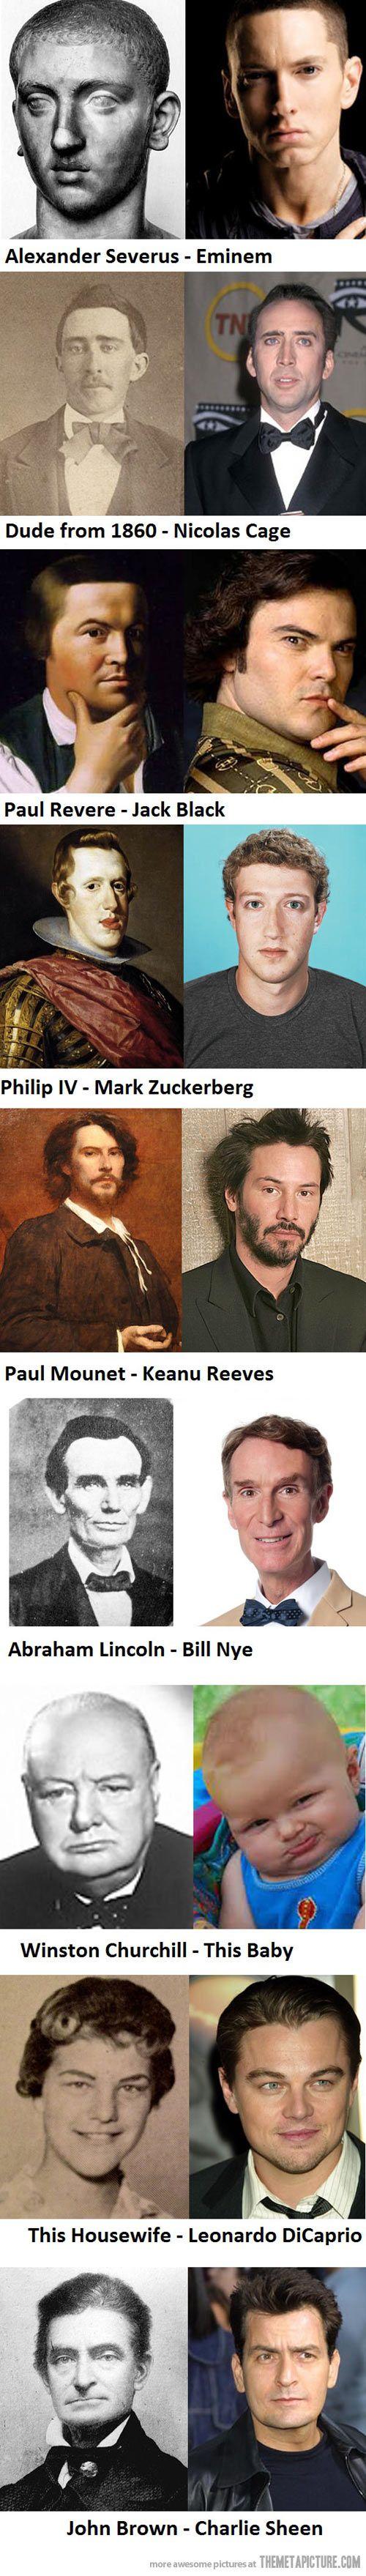 Time travelers or vampires?